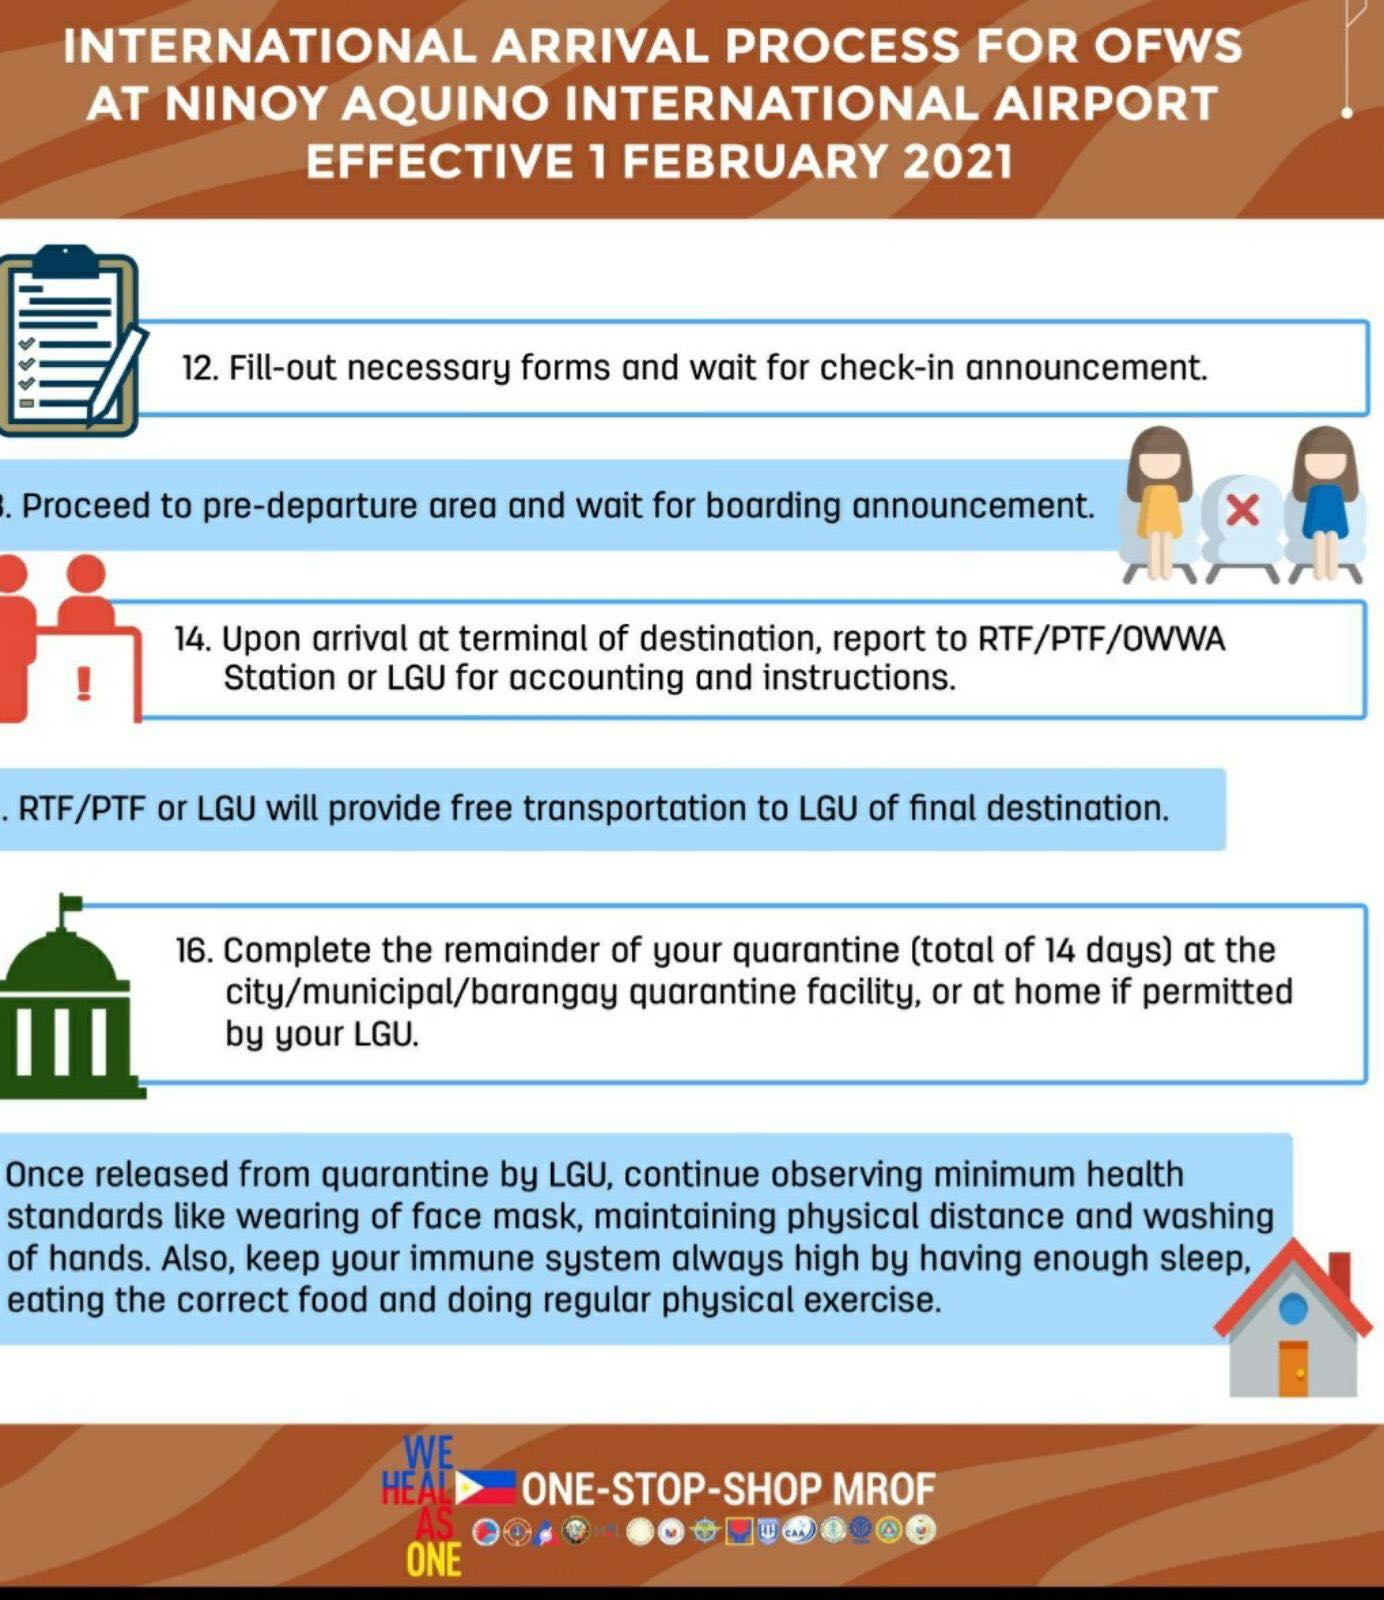 International Arrival Process for OFWs at Ninoy Aquino International Airport (NAIA) - effective February 1, 2021